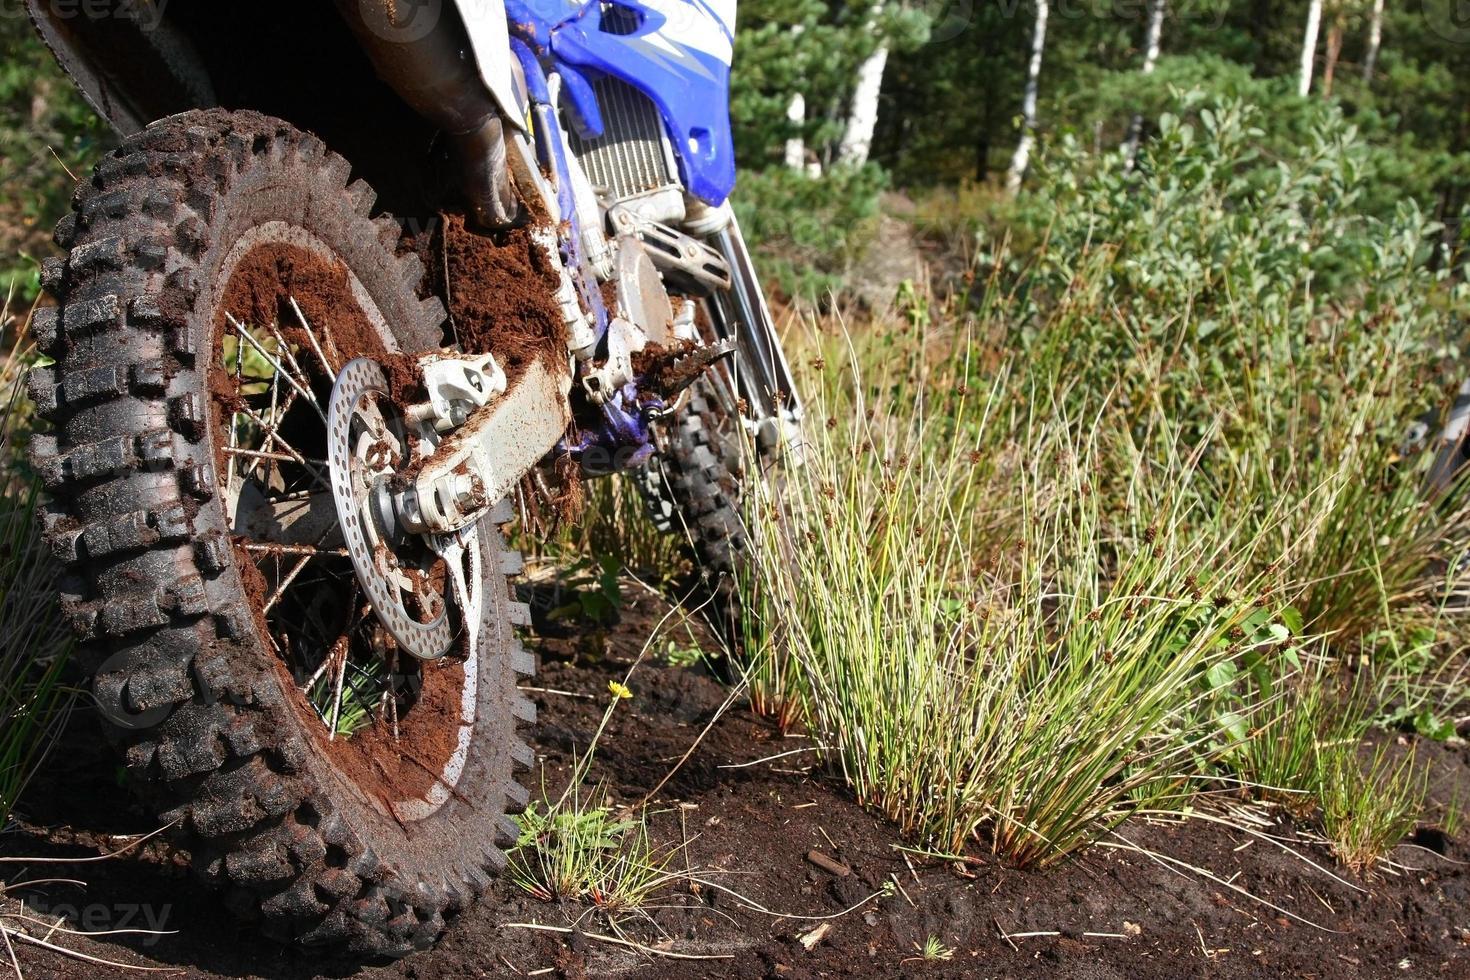 modderig achterwiel van crossmotor foto